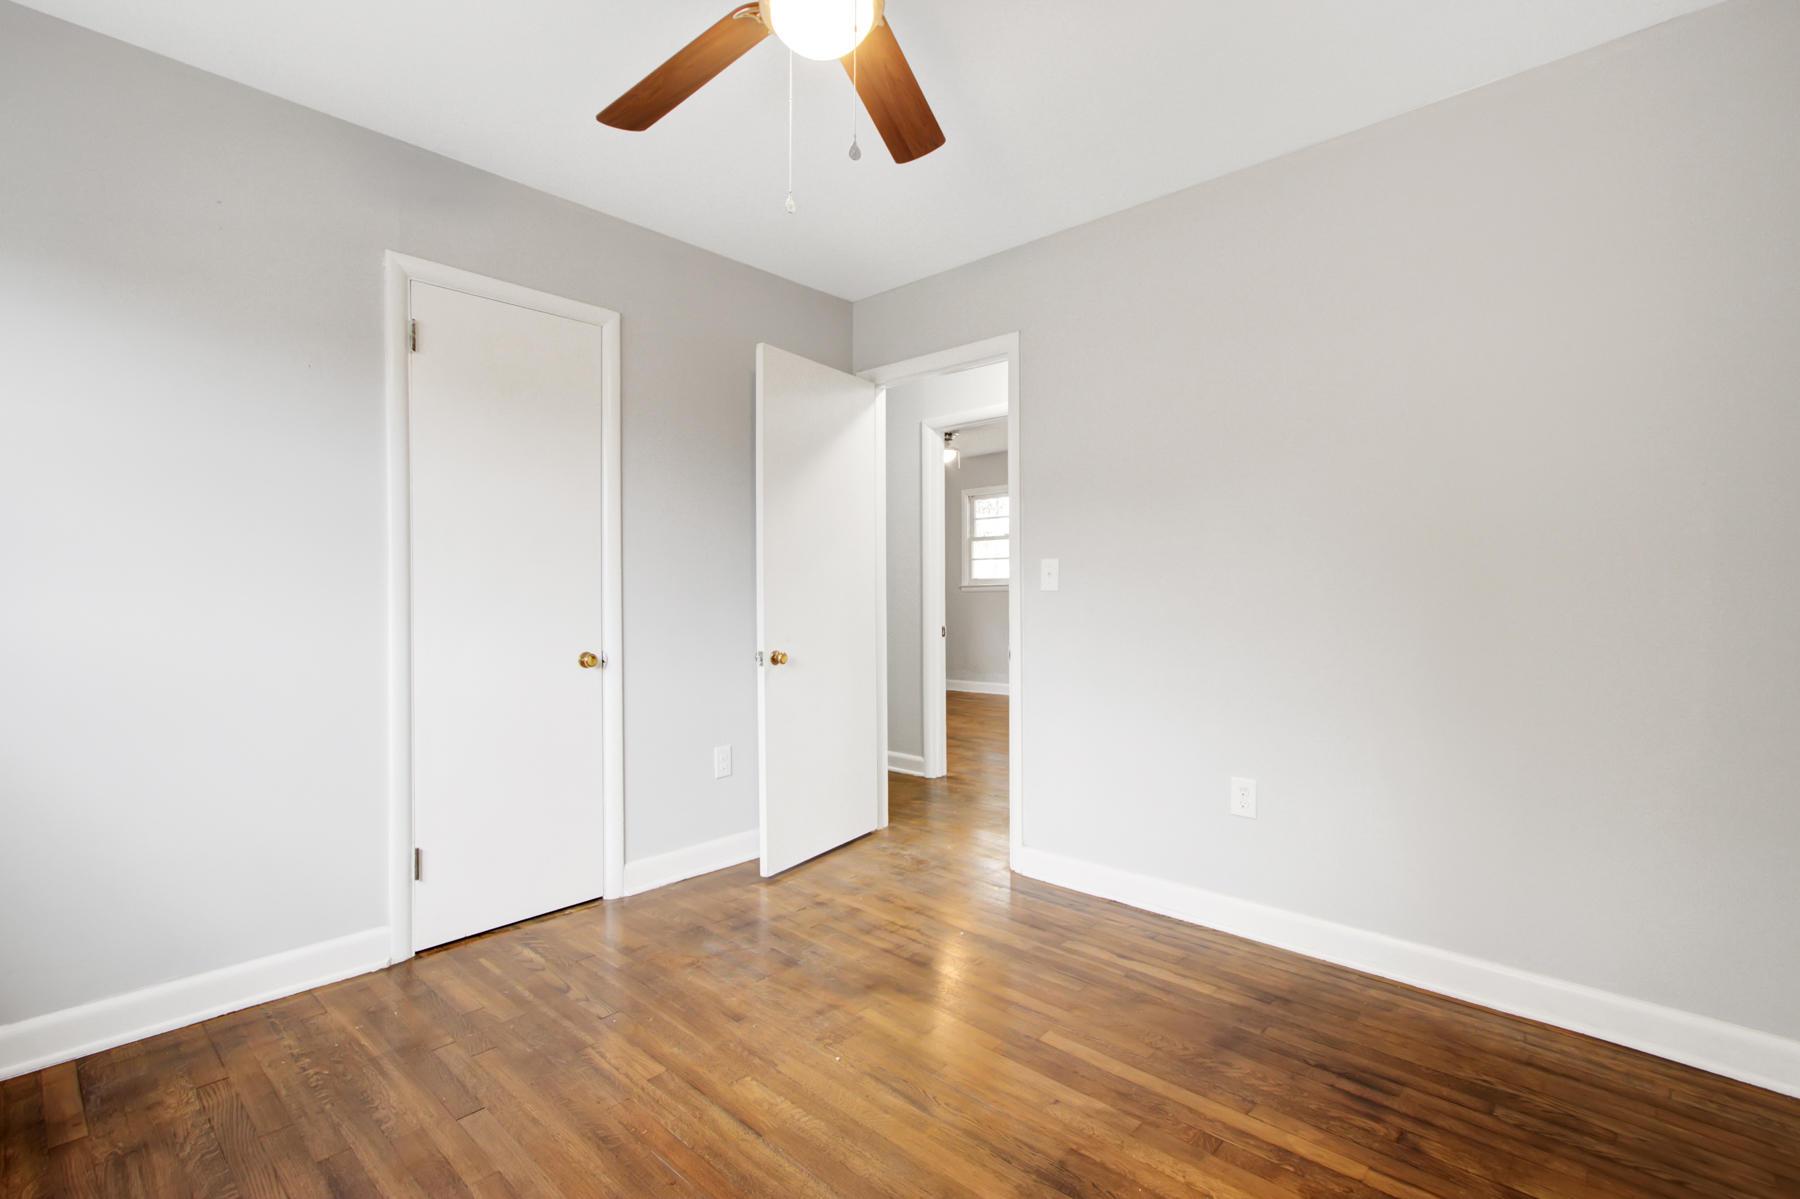 Port Park Homes For Sale - 5820 Sledge, Hanahan, SC - 13